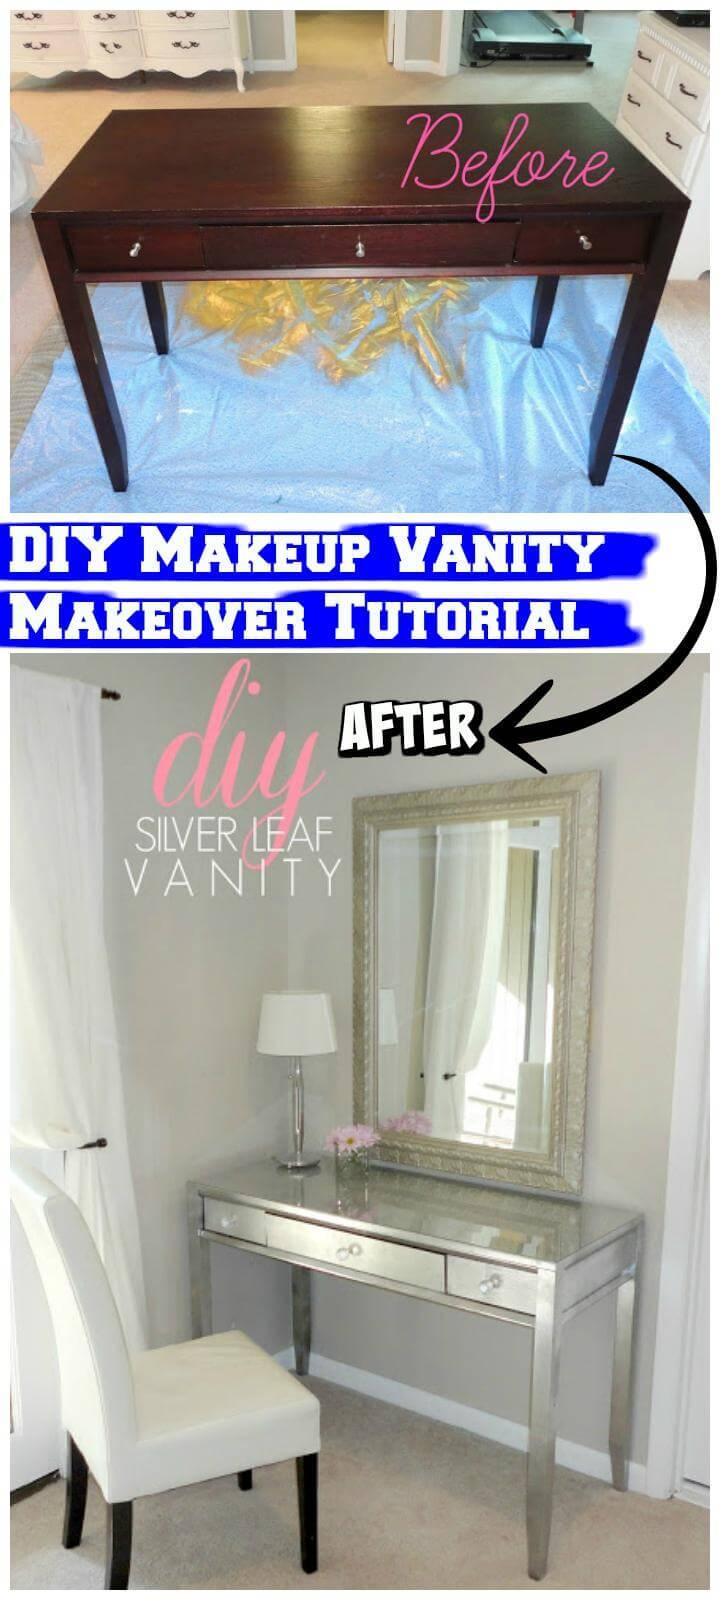 DIY easy makeup vanity makeover